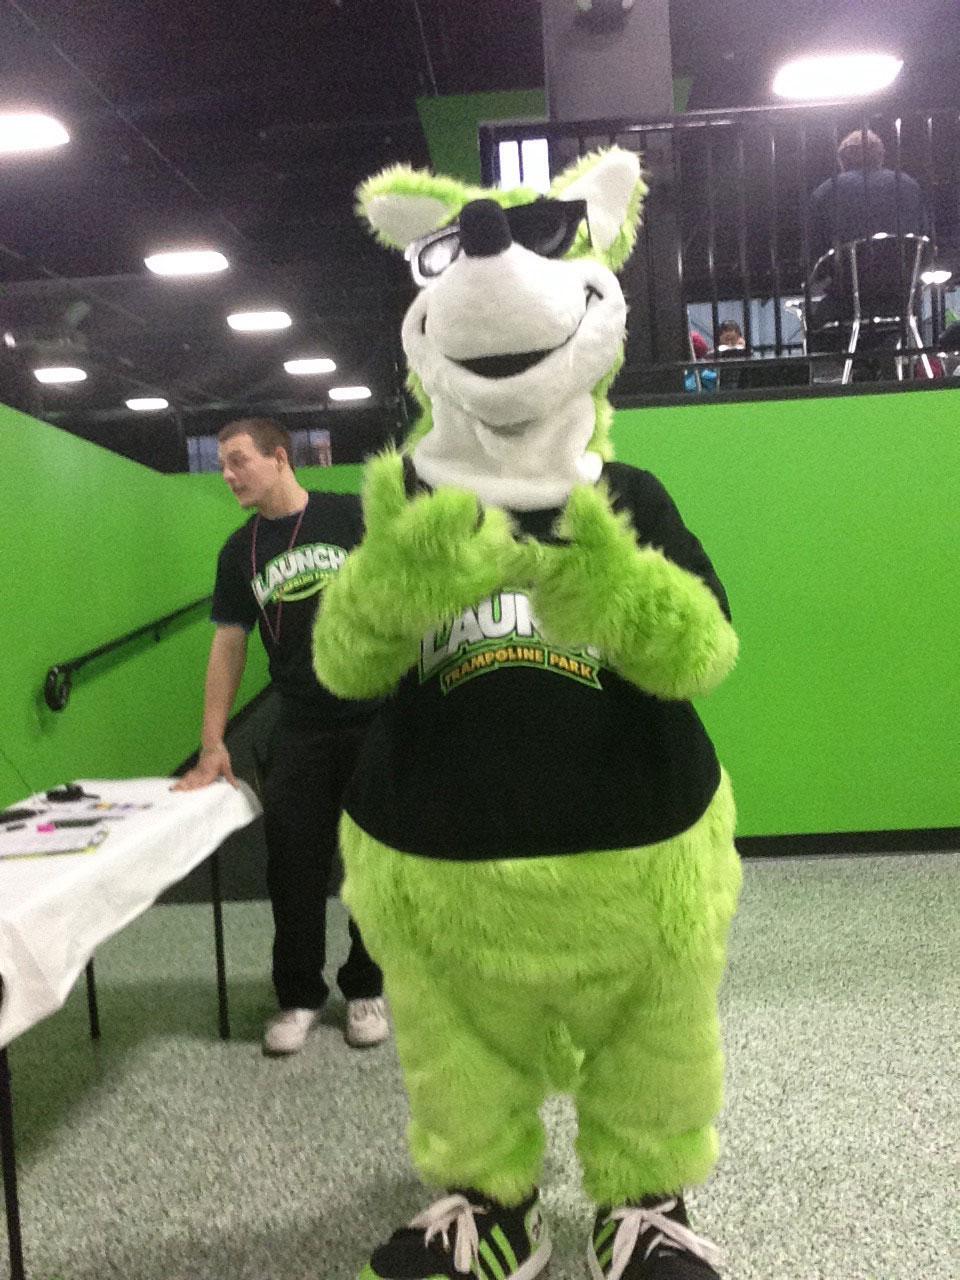 Joey the Kangaroo - Mascot for Launch Trampoline Park